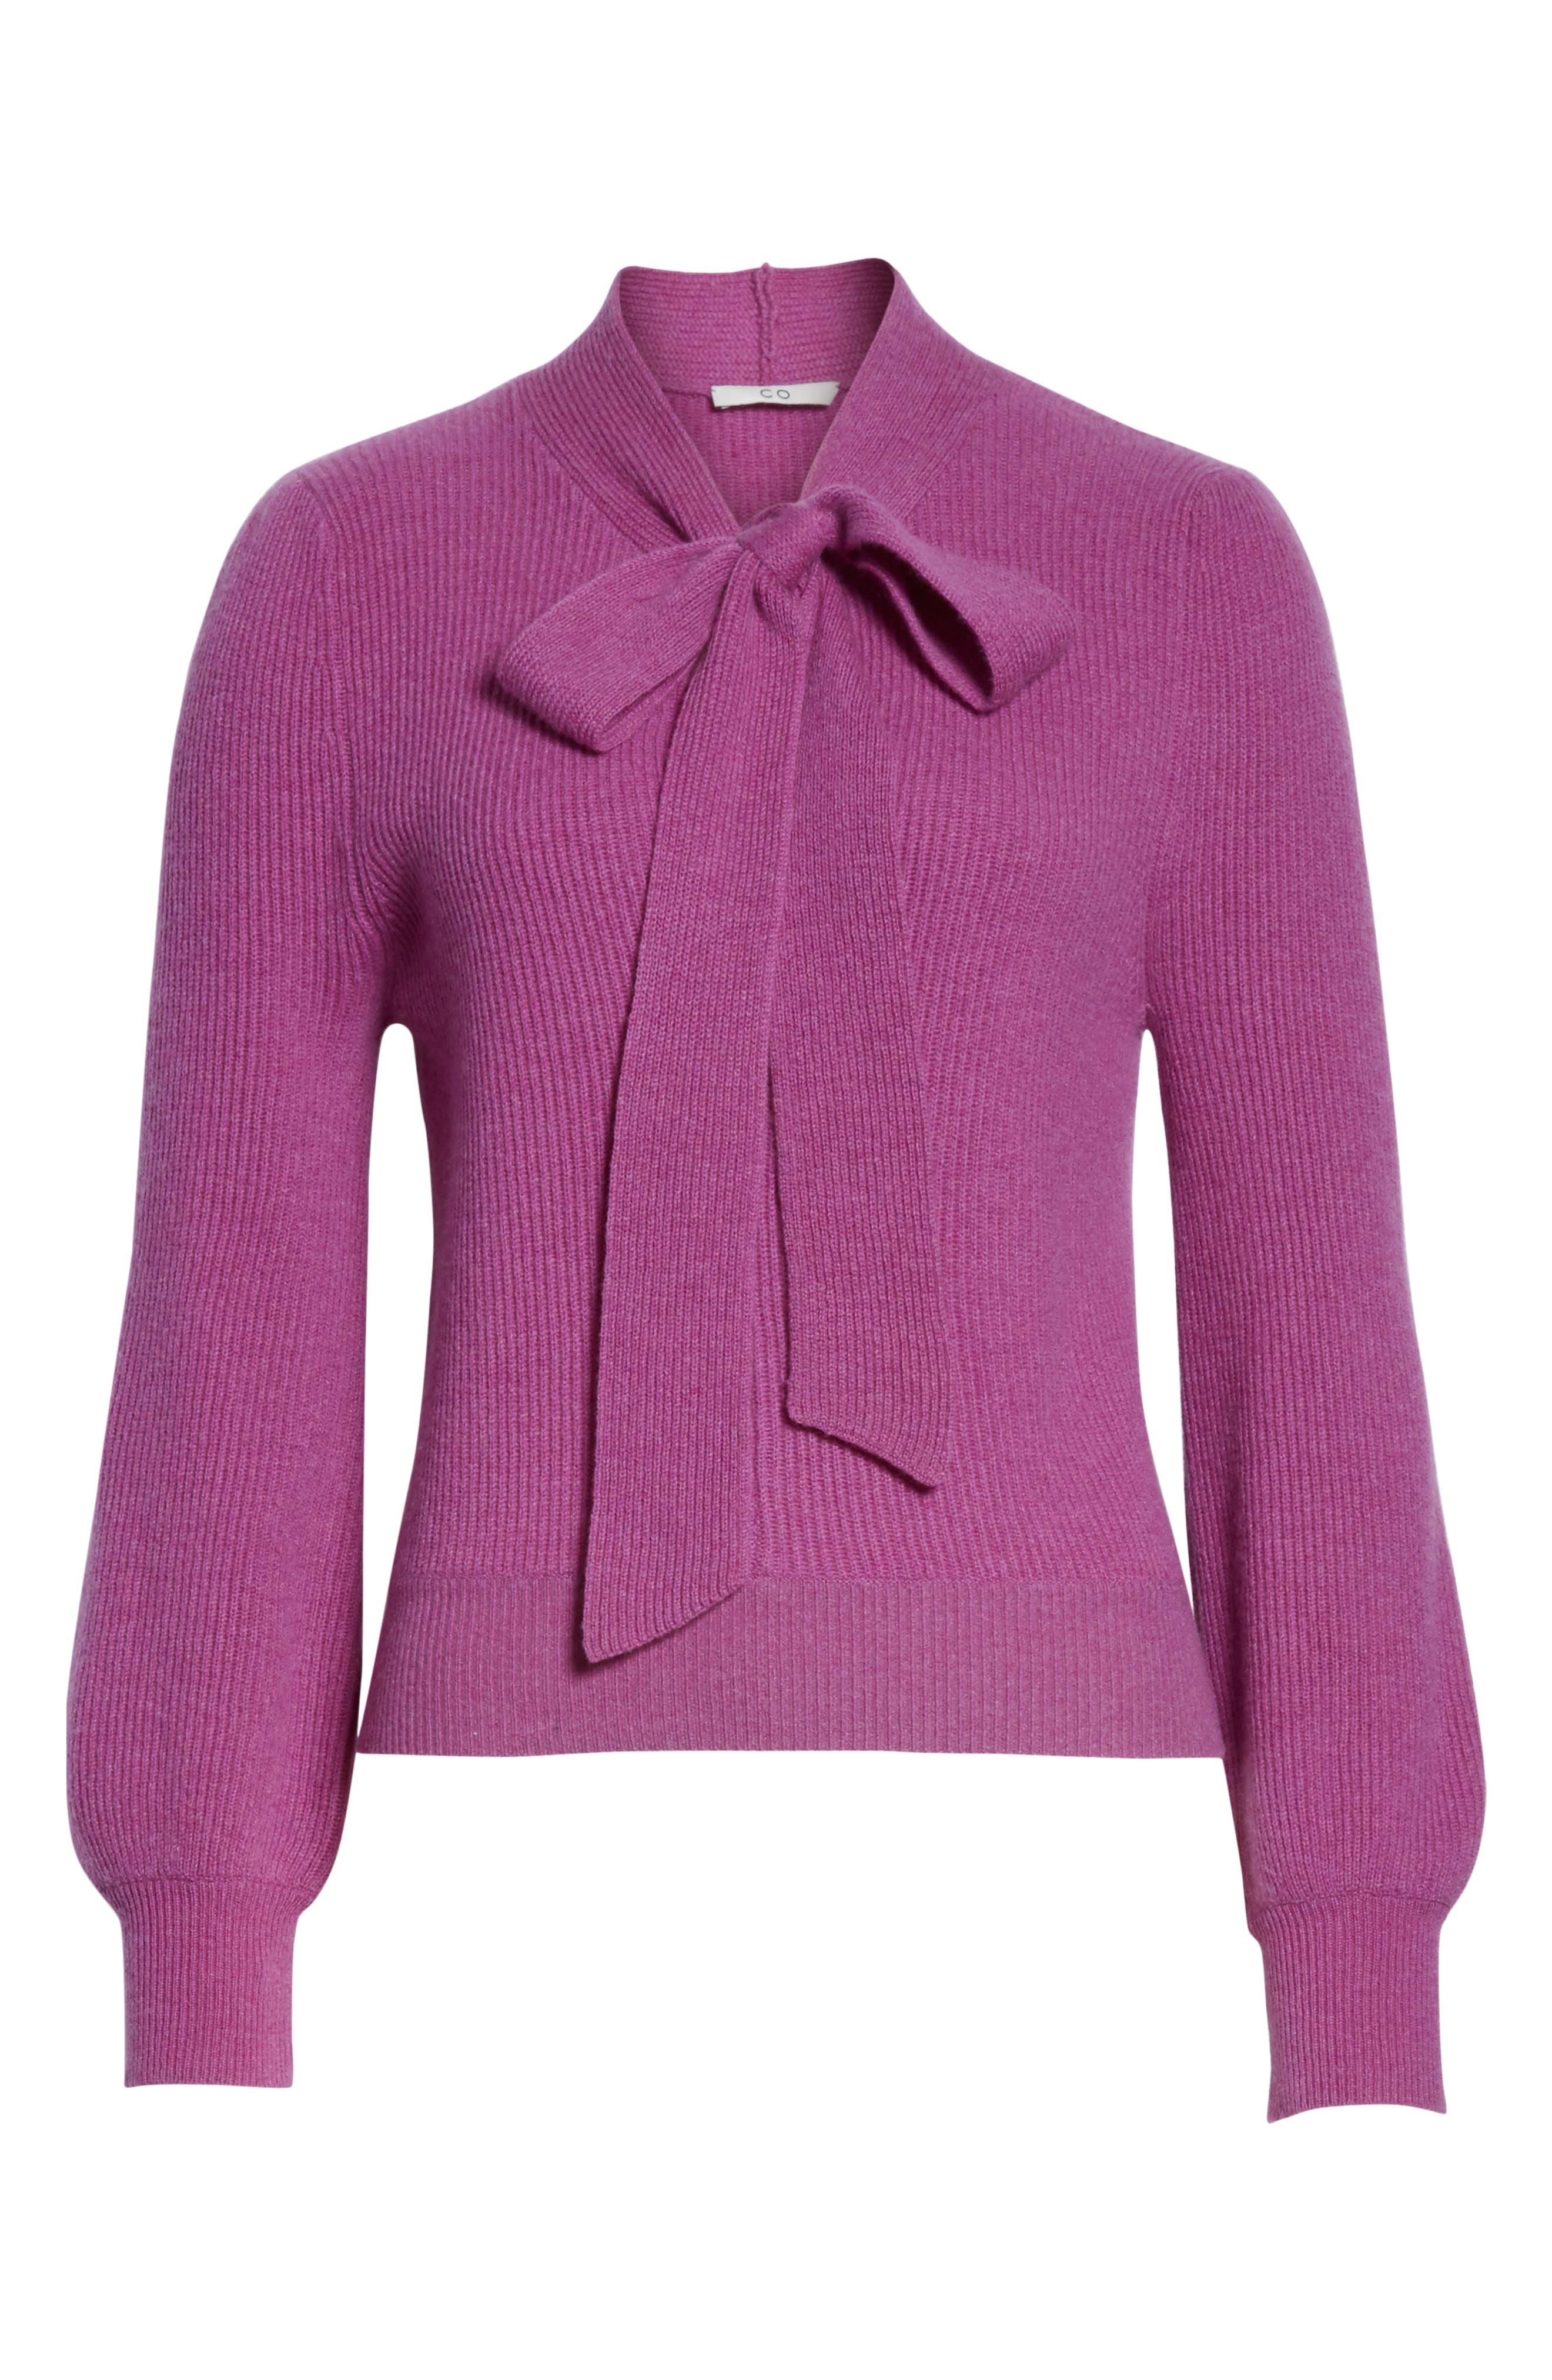 CO,                             Tie Neck Cashmere Sweater,                             Alternate thumbnail 6, color,                             679